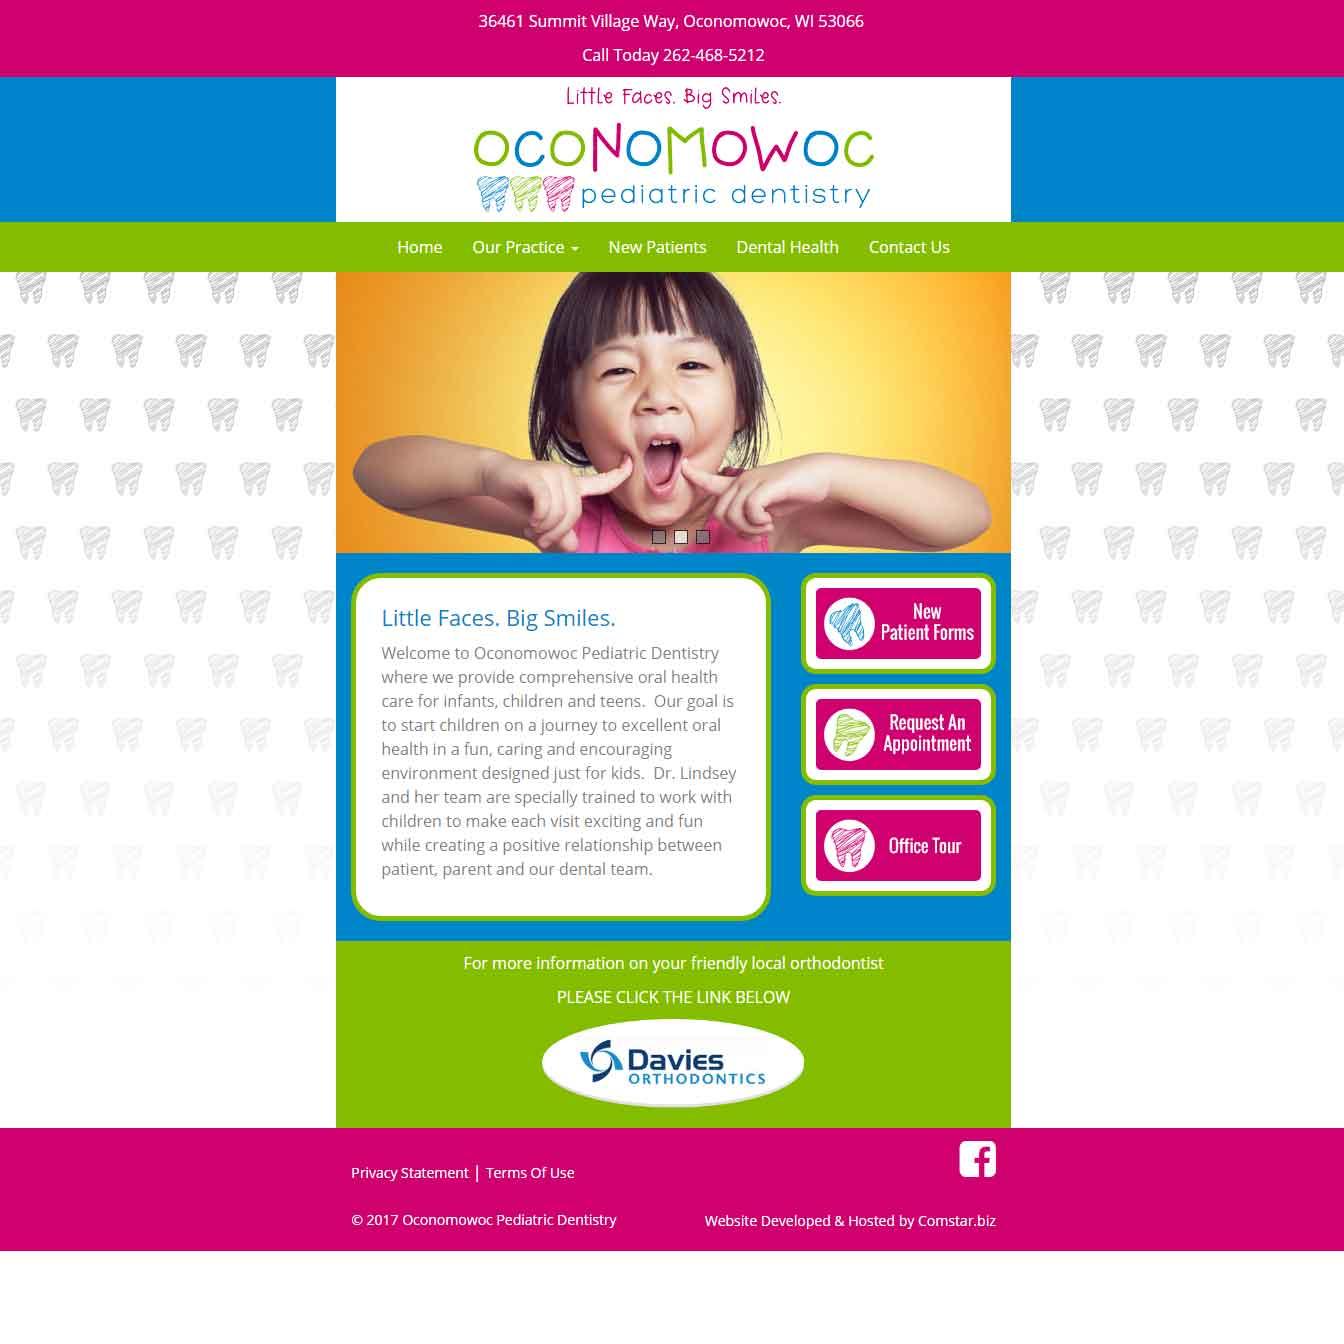 Oconomowoc Pediatric Dentistry